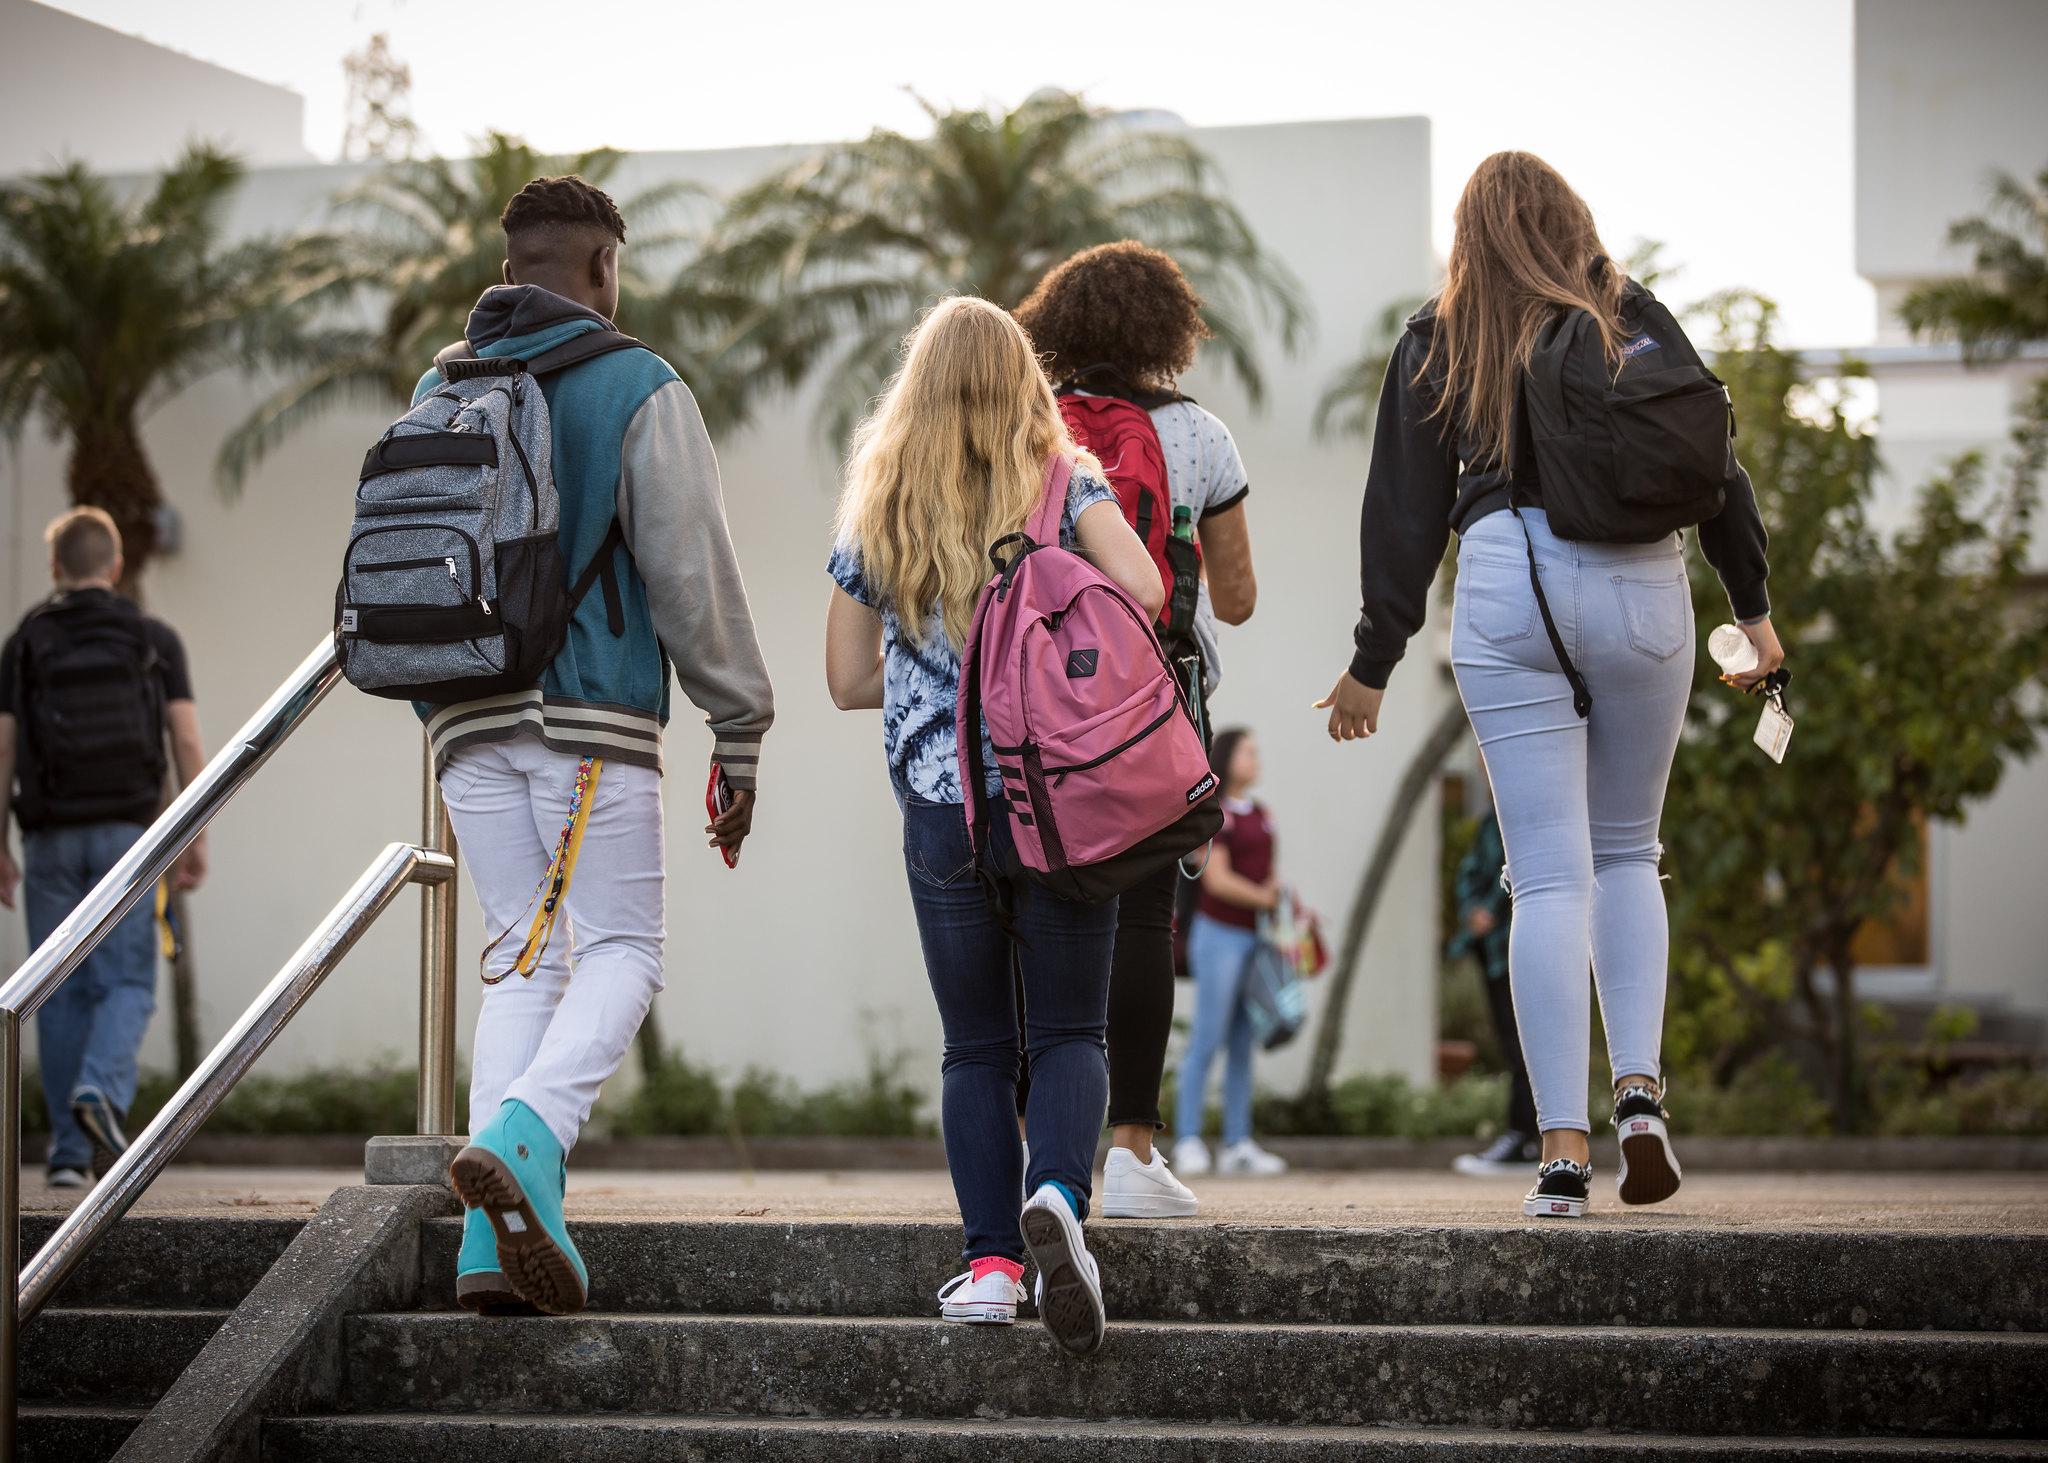 Students at Kubasaki High School in Okinawa, Japan, return from summer break in August 2018. (DoDEA)